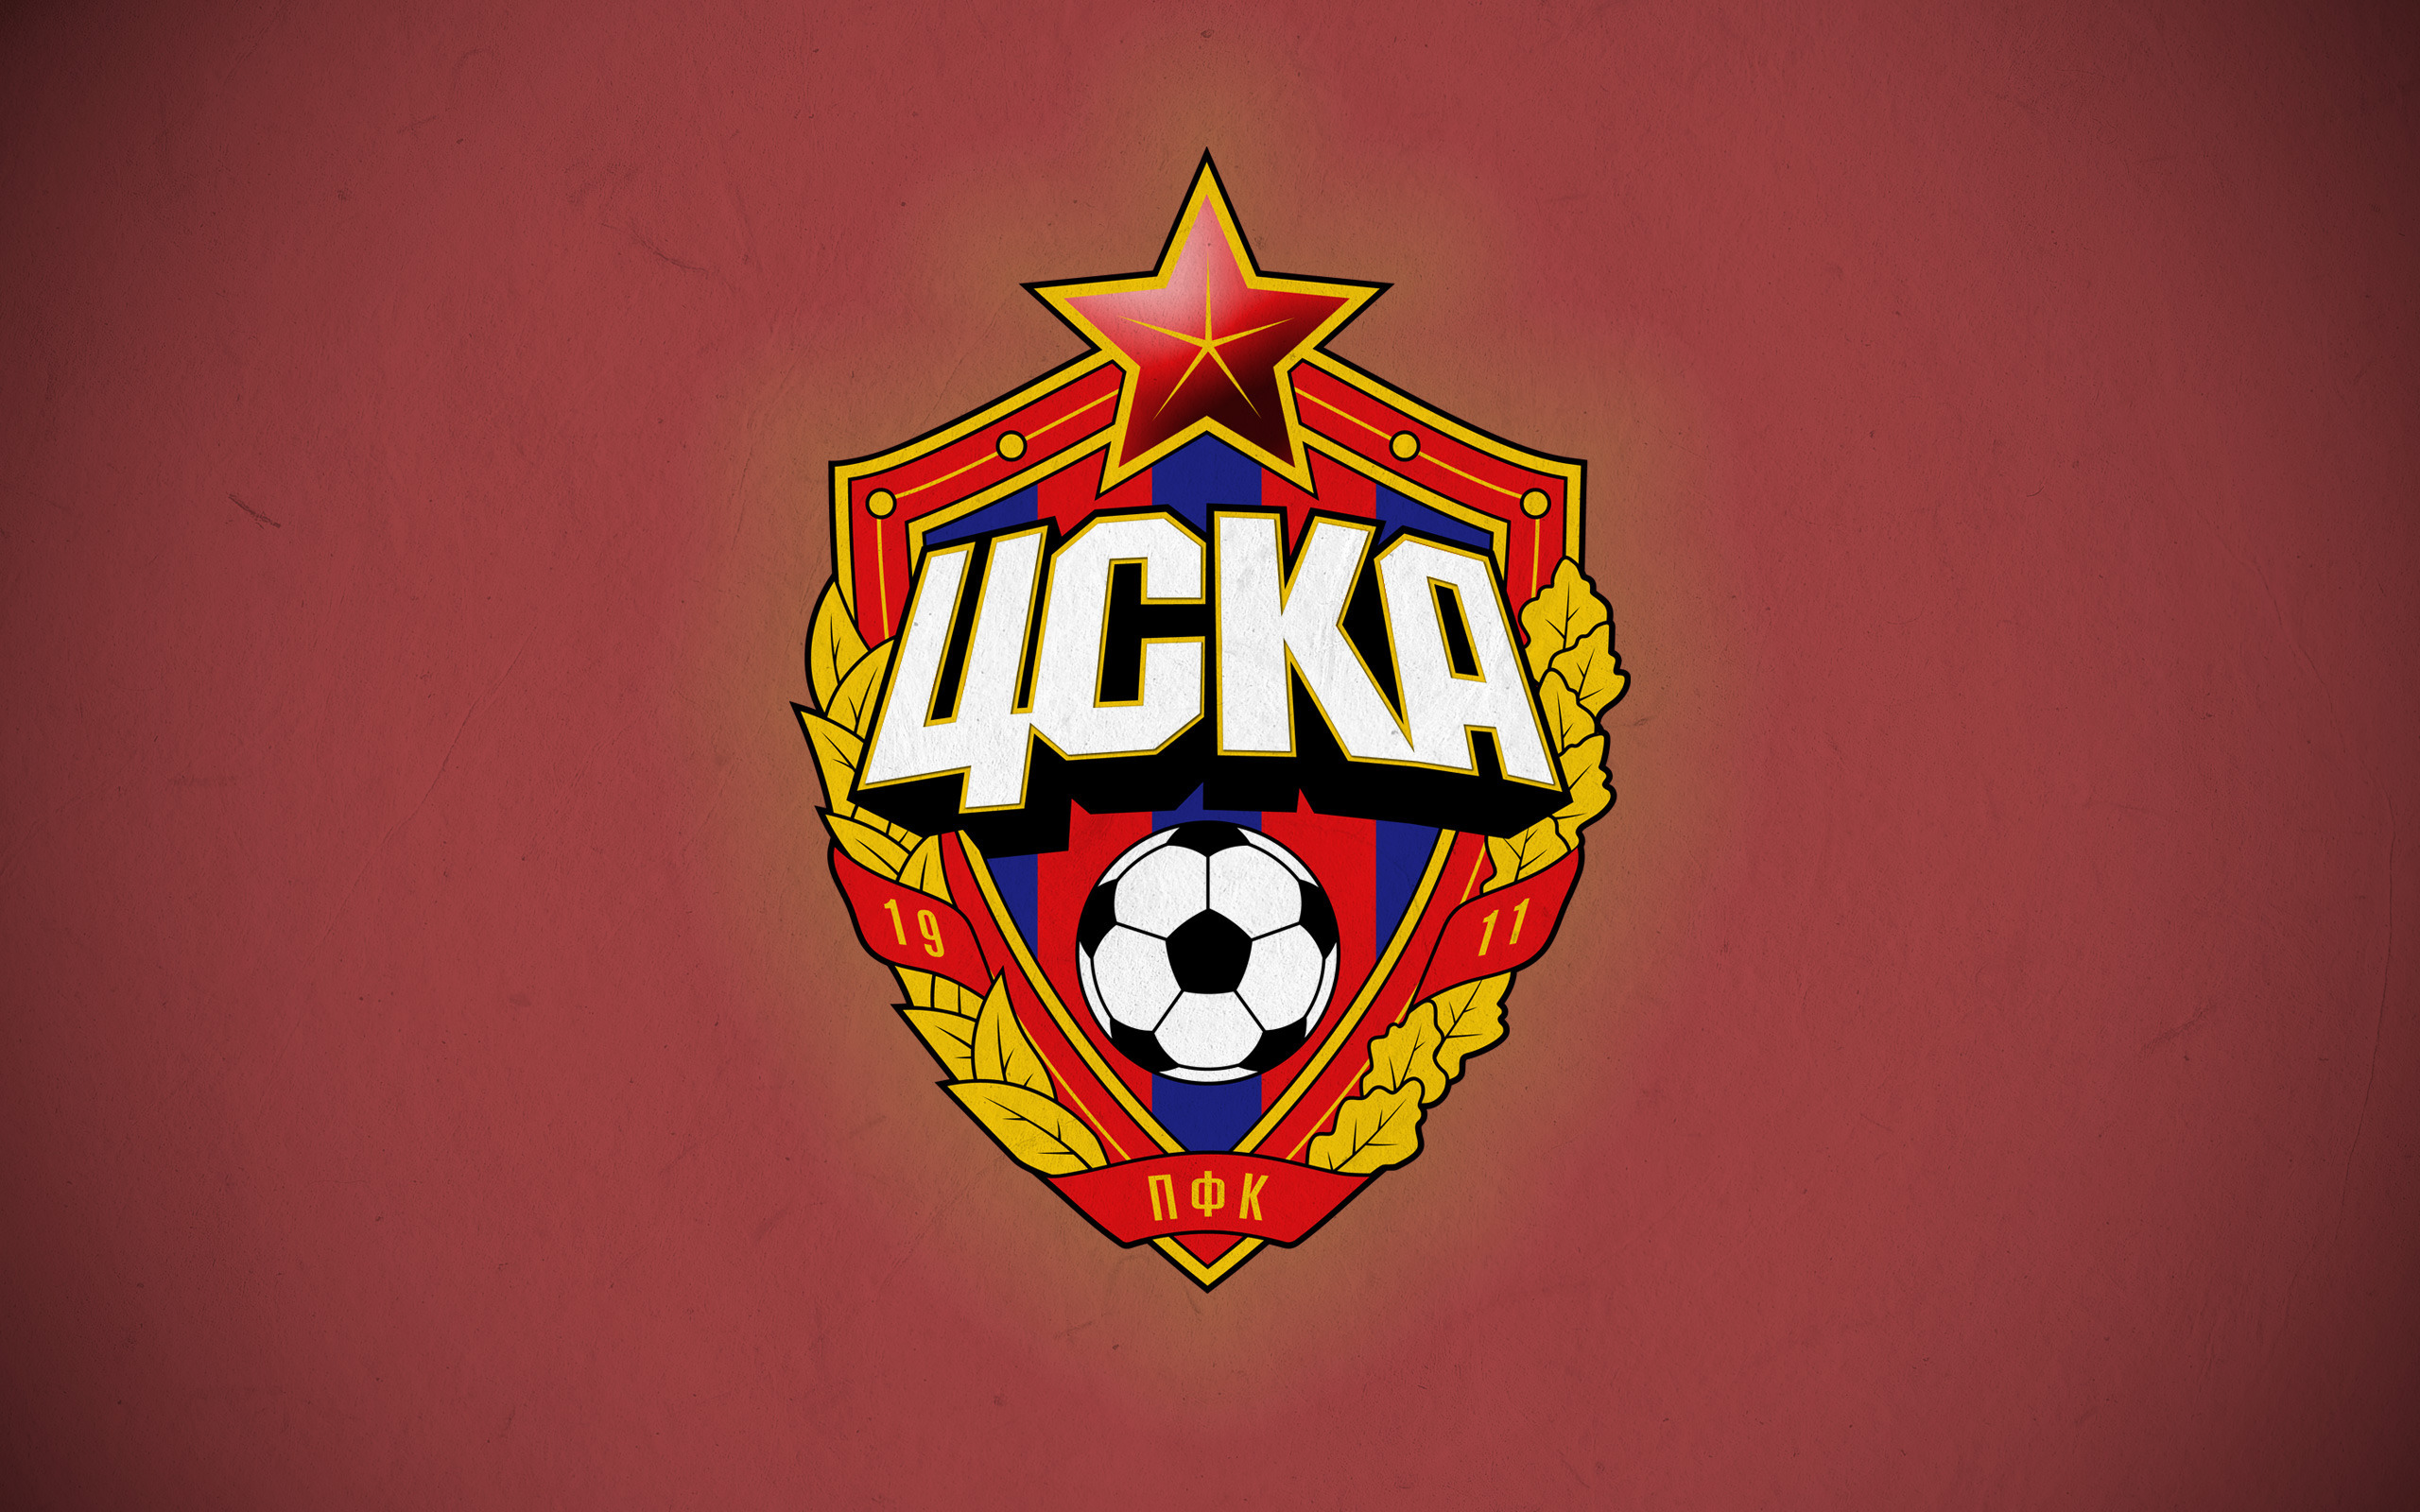 PFC CSKA Moscow HD Wallpaper Background Image 2560x1600 ID 2560x1600